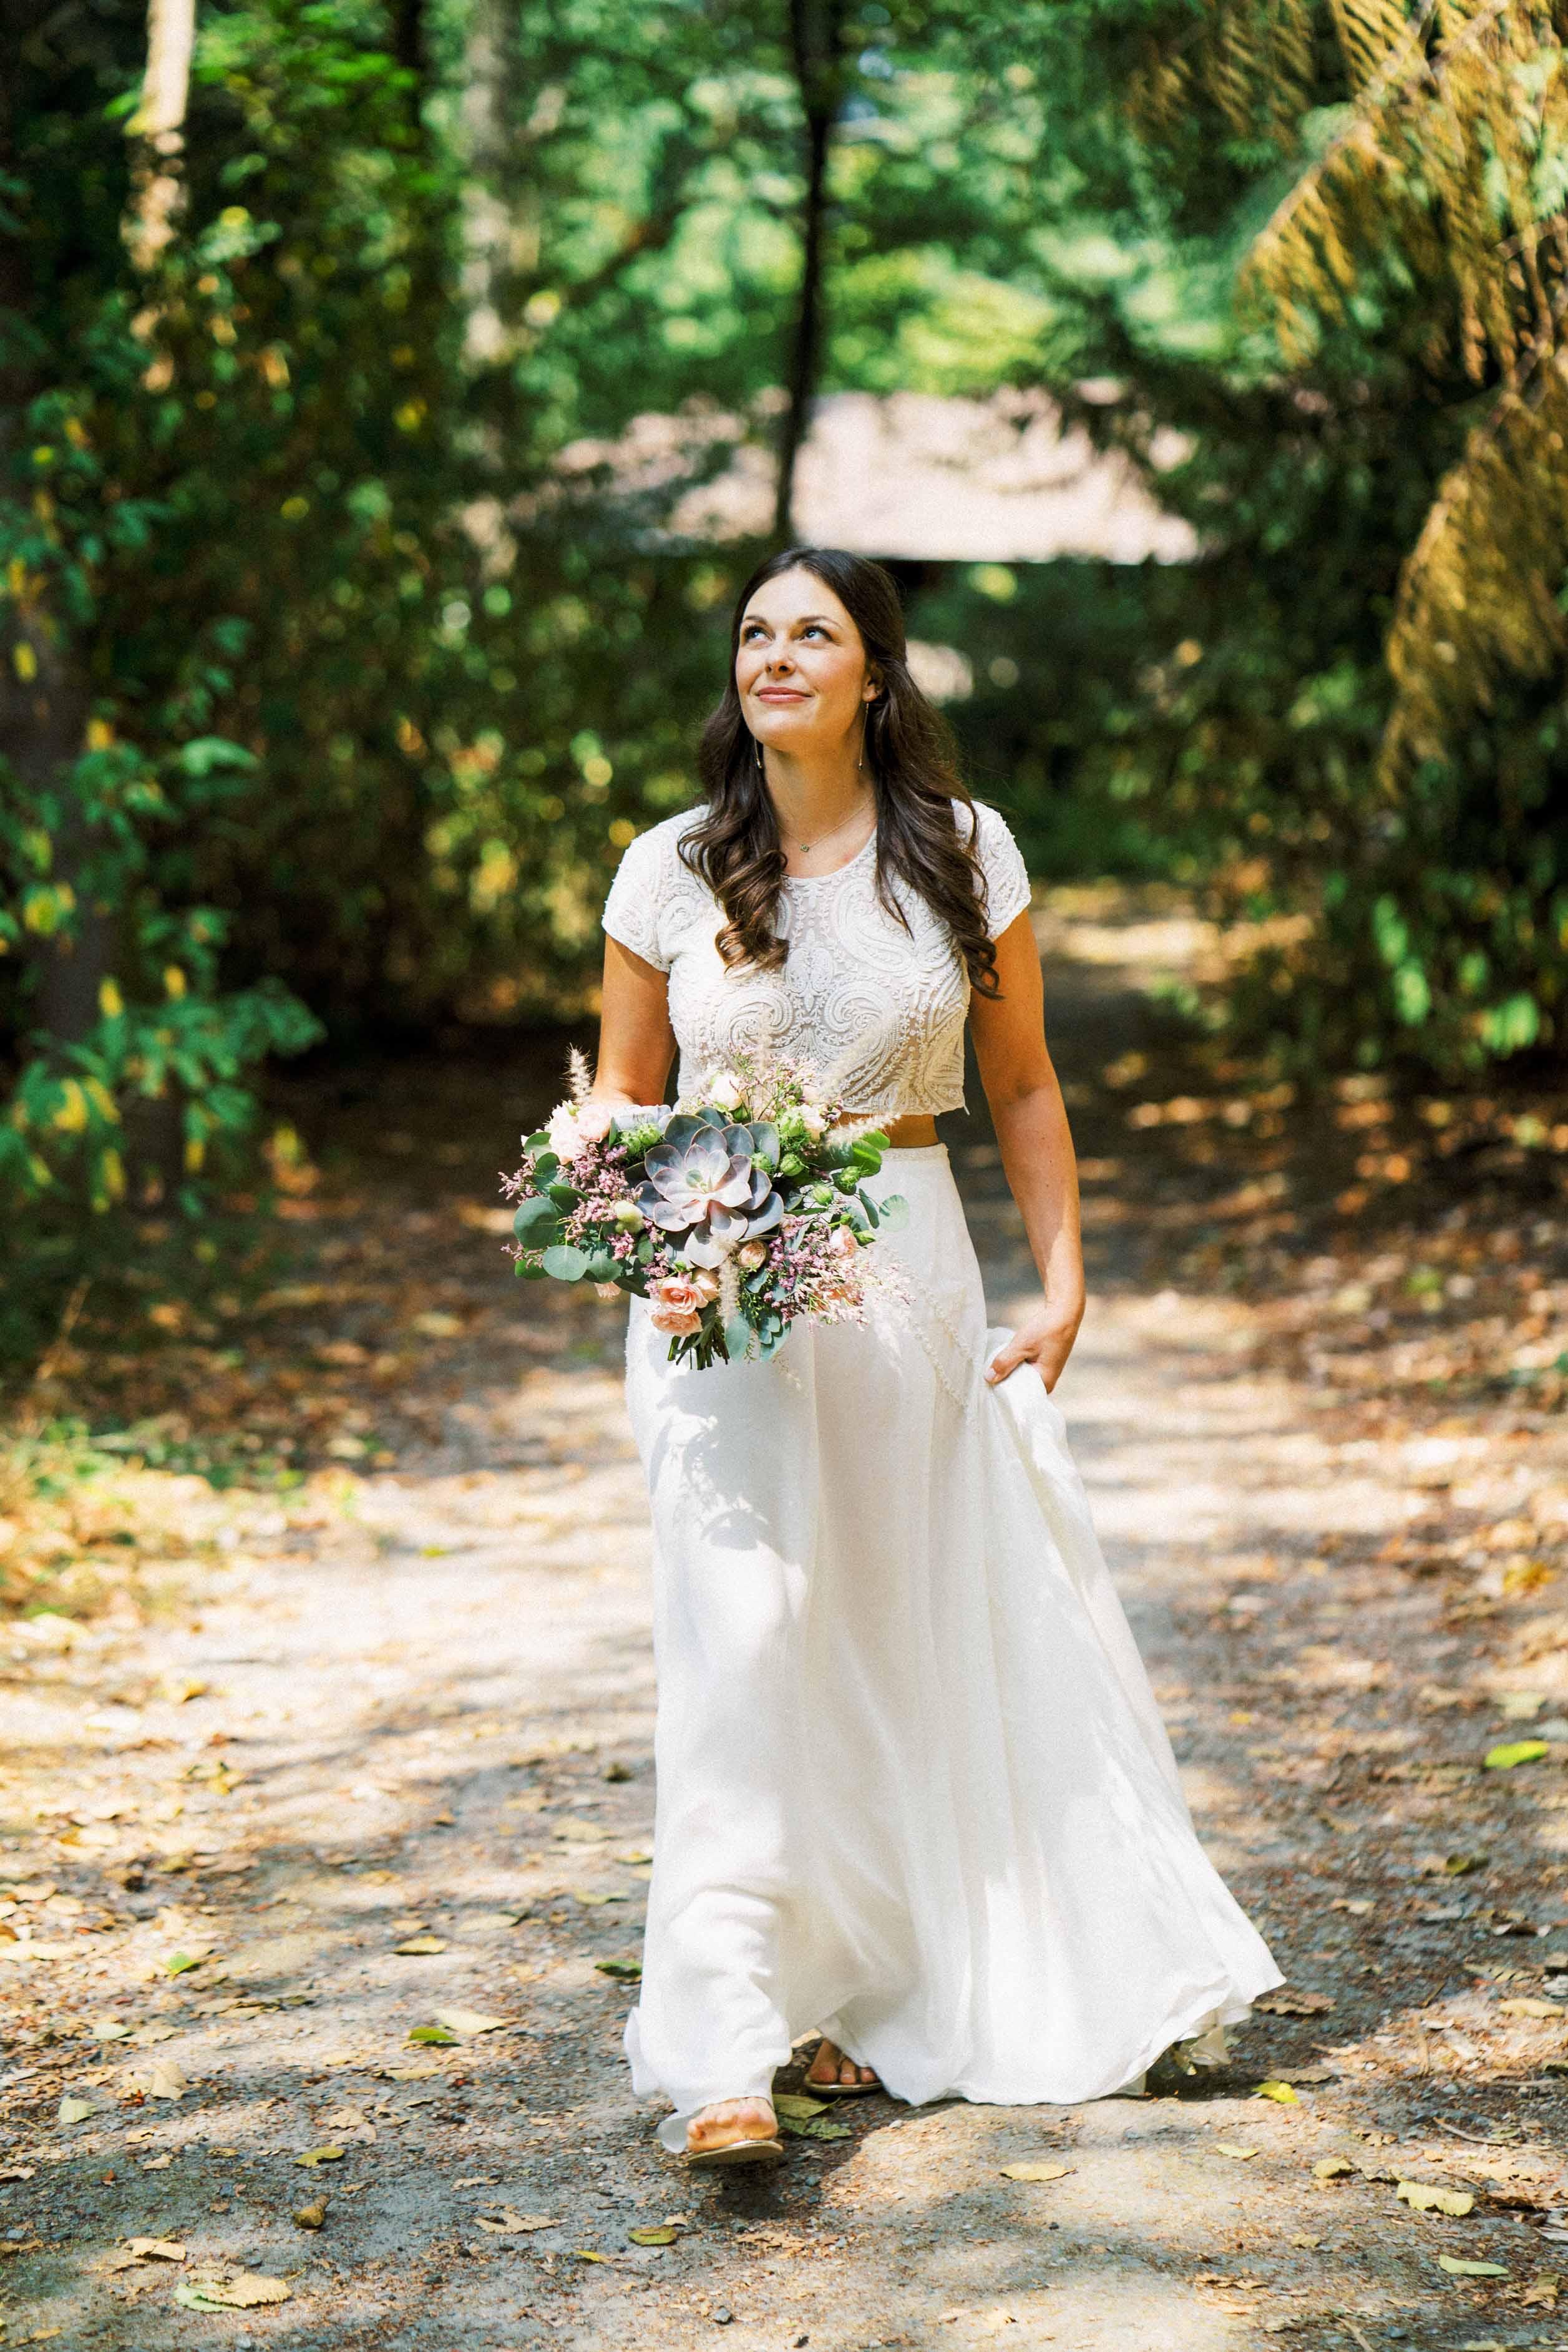 Bride with succulent bouquet - Woodmark Hotel Wedding by Flora Nova Design Seattle